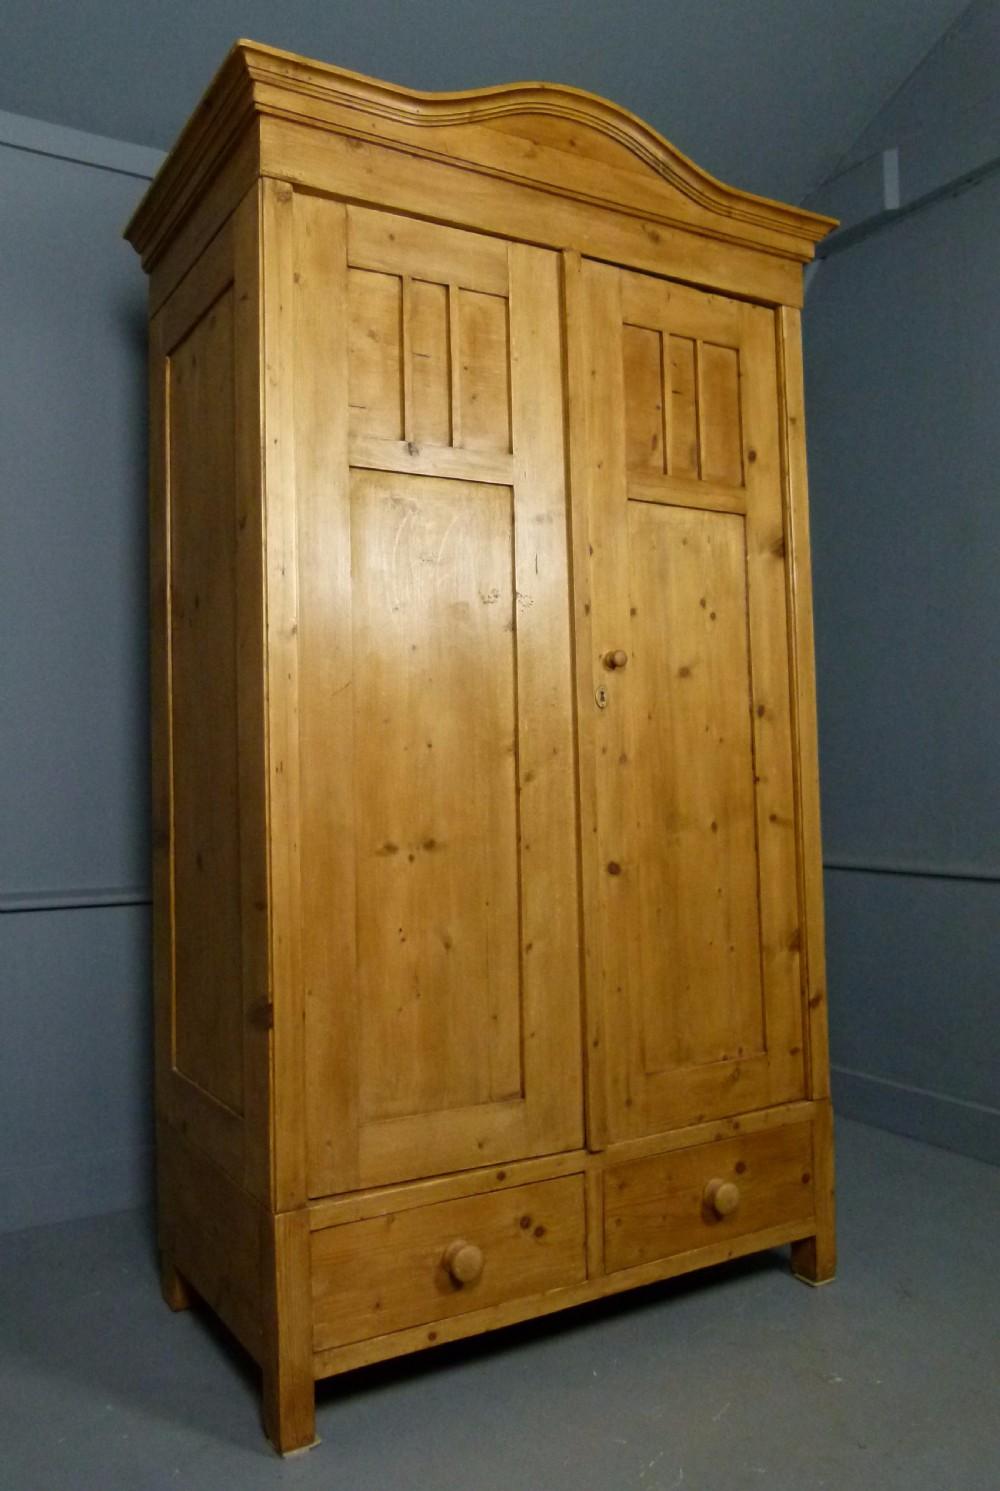 edwardian french pine armoire wardrobe knockdown. Black Bedroom Furniture Sets. Home Design Ideas